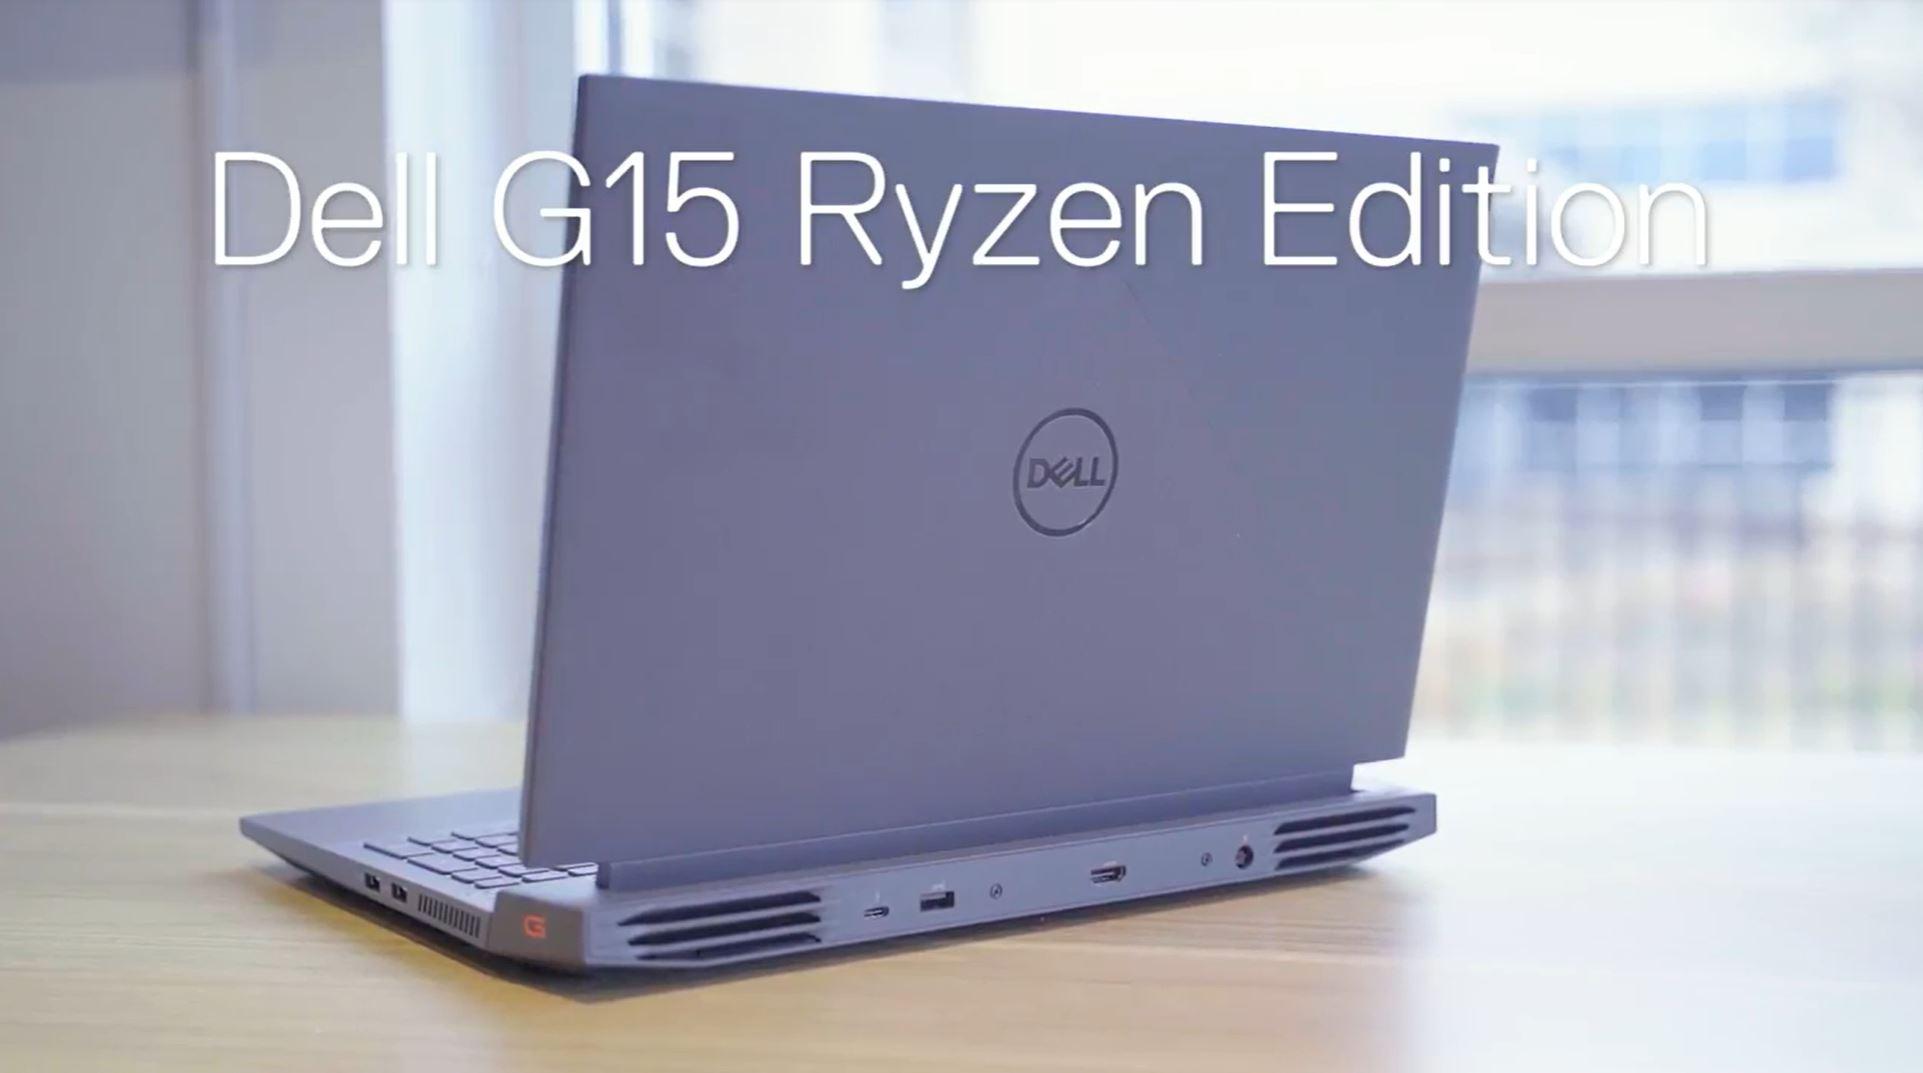 Dell G15 Ryzen Edition Spesifikasi